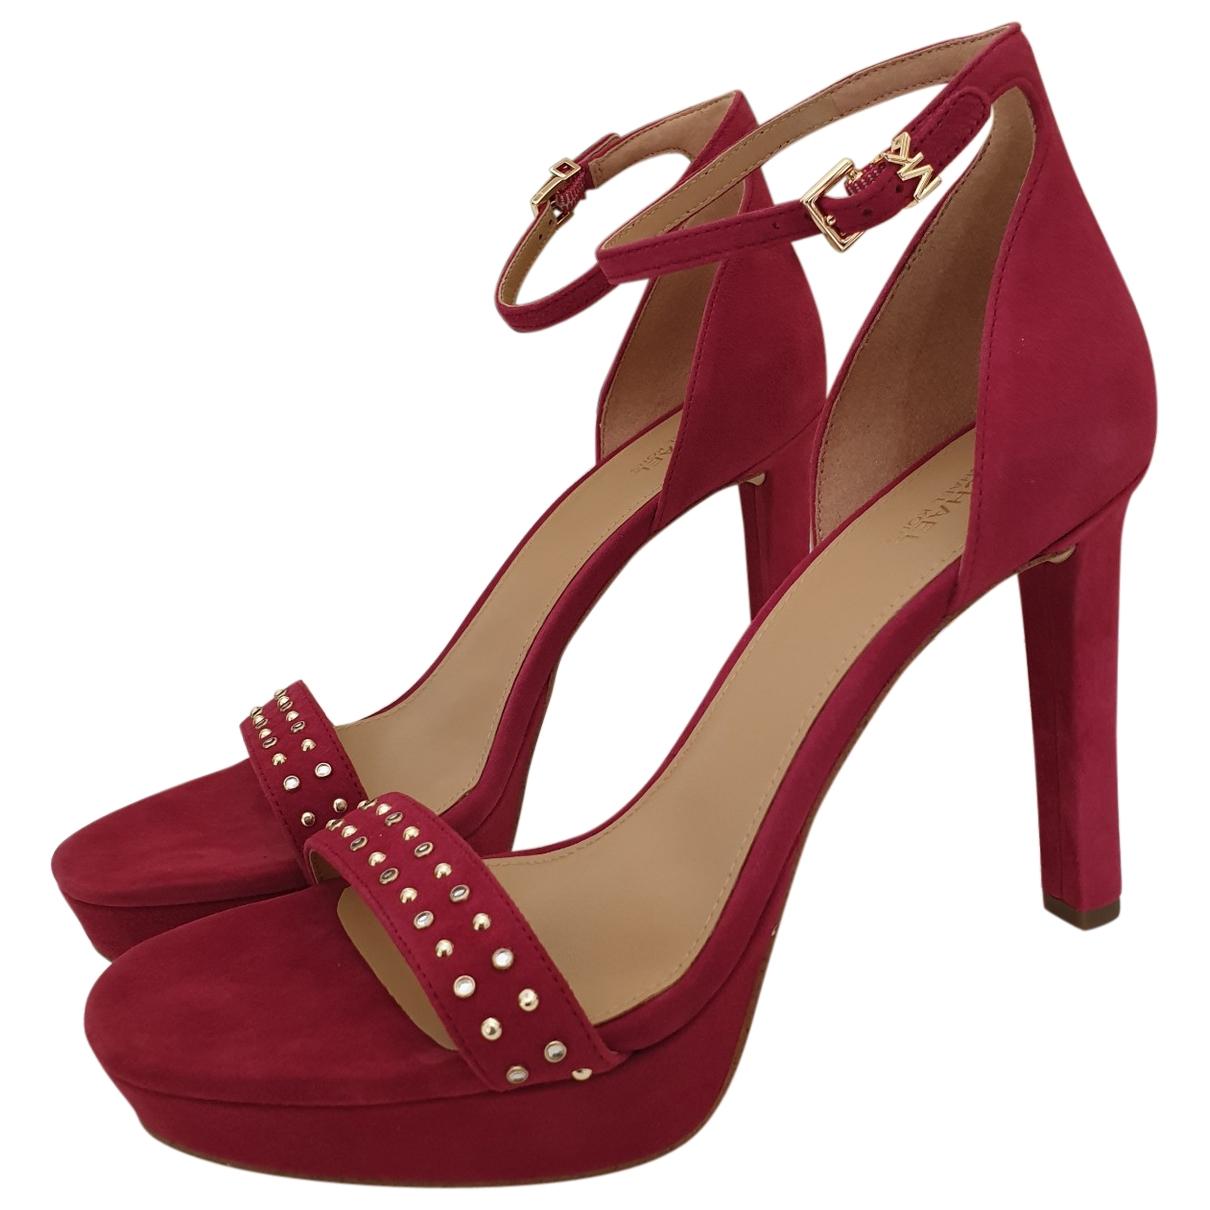 Michael Kors \N Red Leather Heels for Women 40 EU